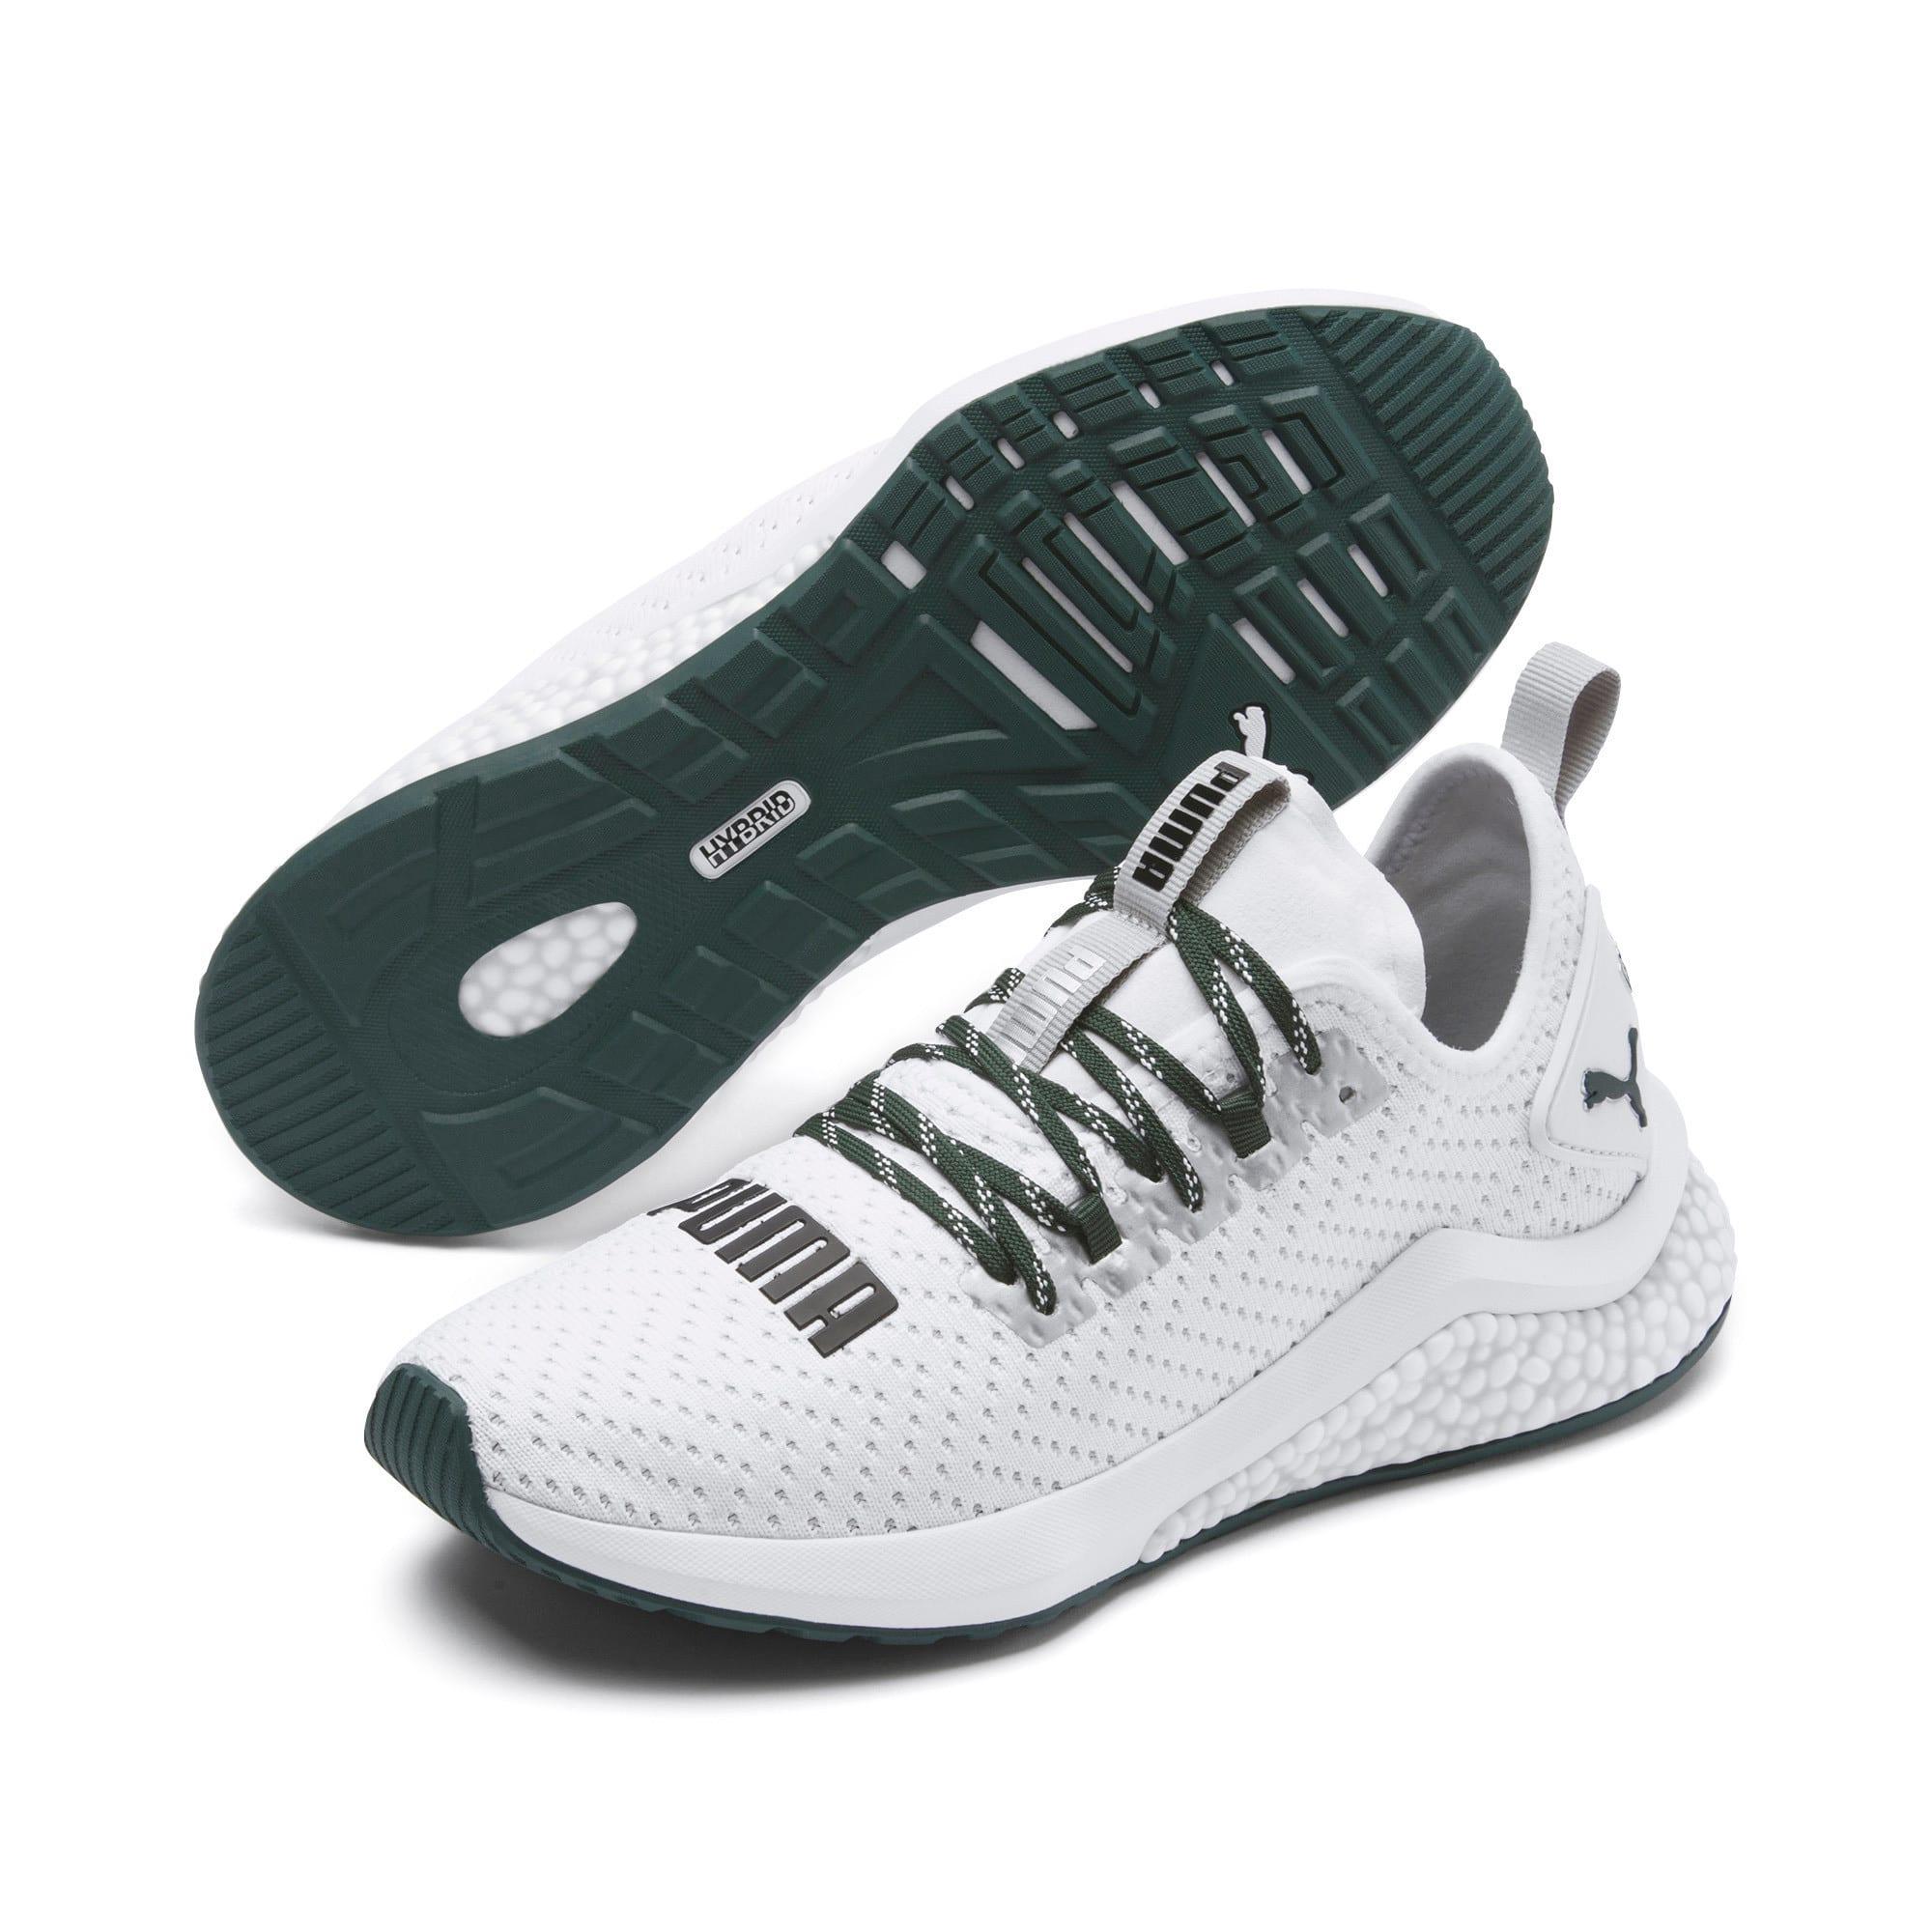 Thumbnail 3 of HYBRID NX Trailblazer Women's Running Shoes, Puma White-Ponderosa Pine, medium